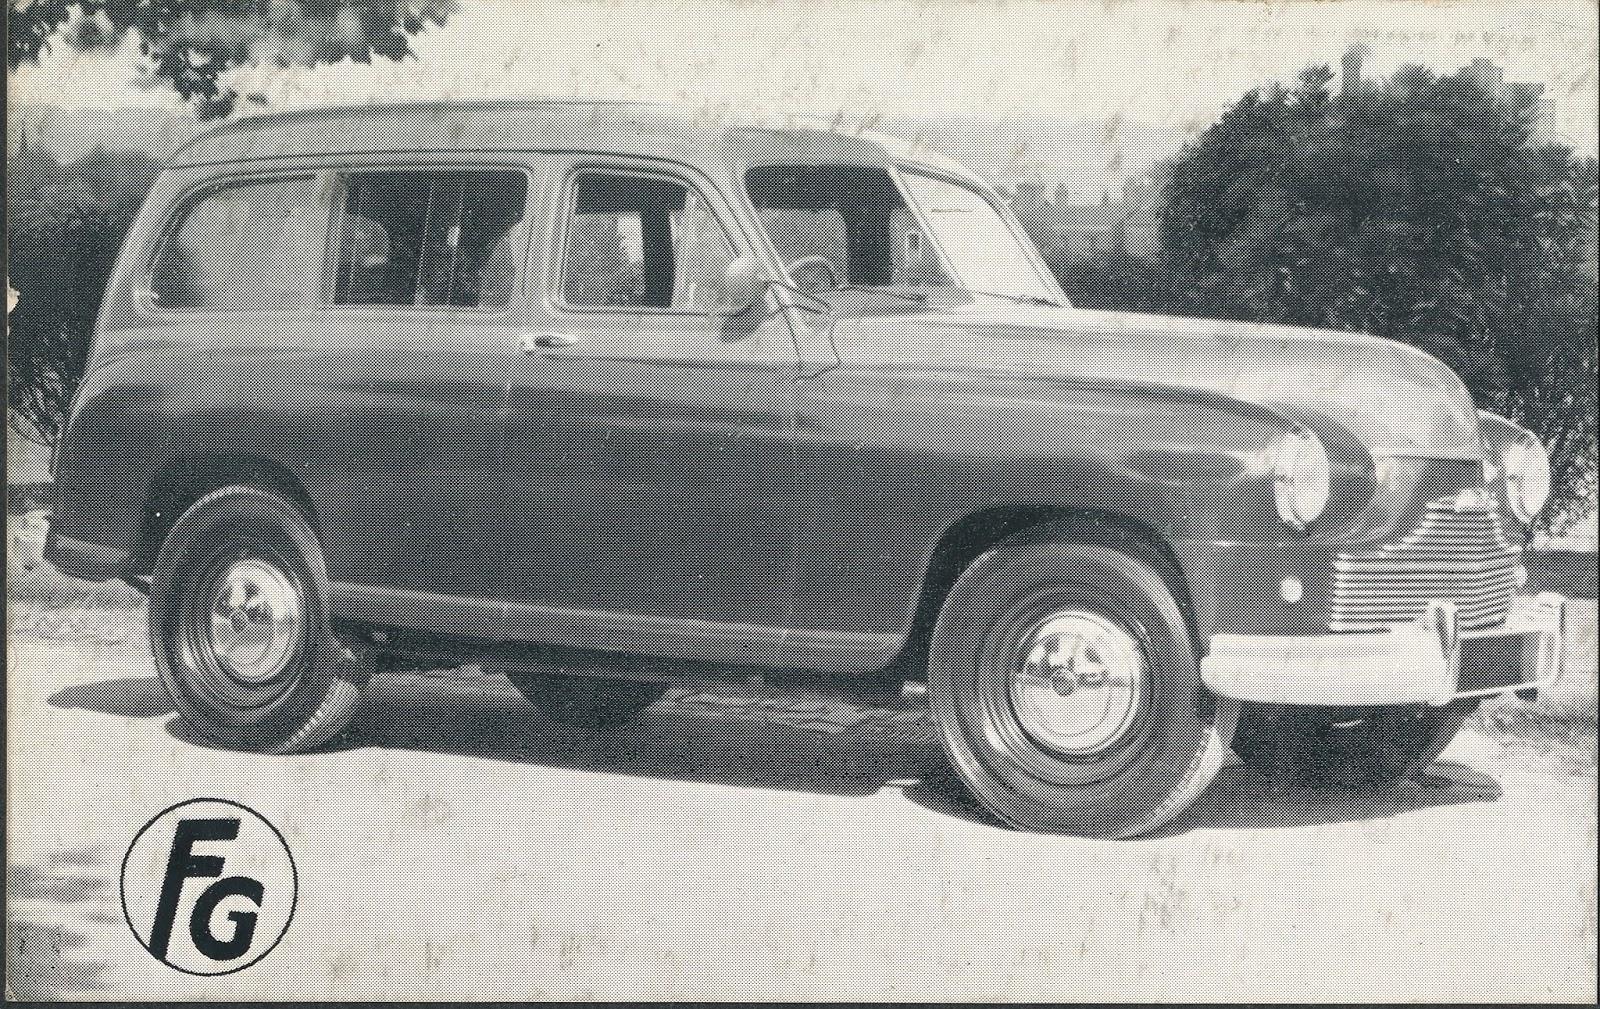 Car Dealers Birmingham >> Vitessesteve - blog: Frank Grounds Ltd -Triumph Car Dealers 23B